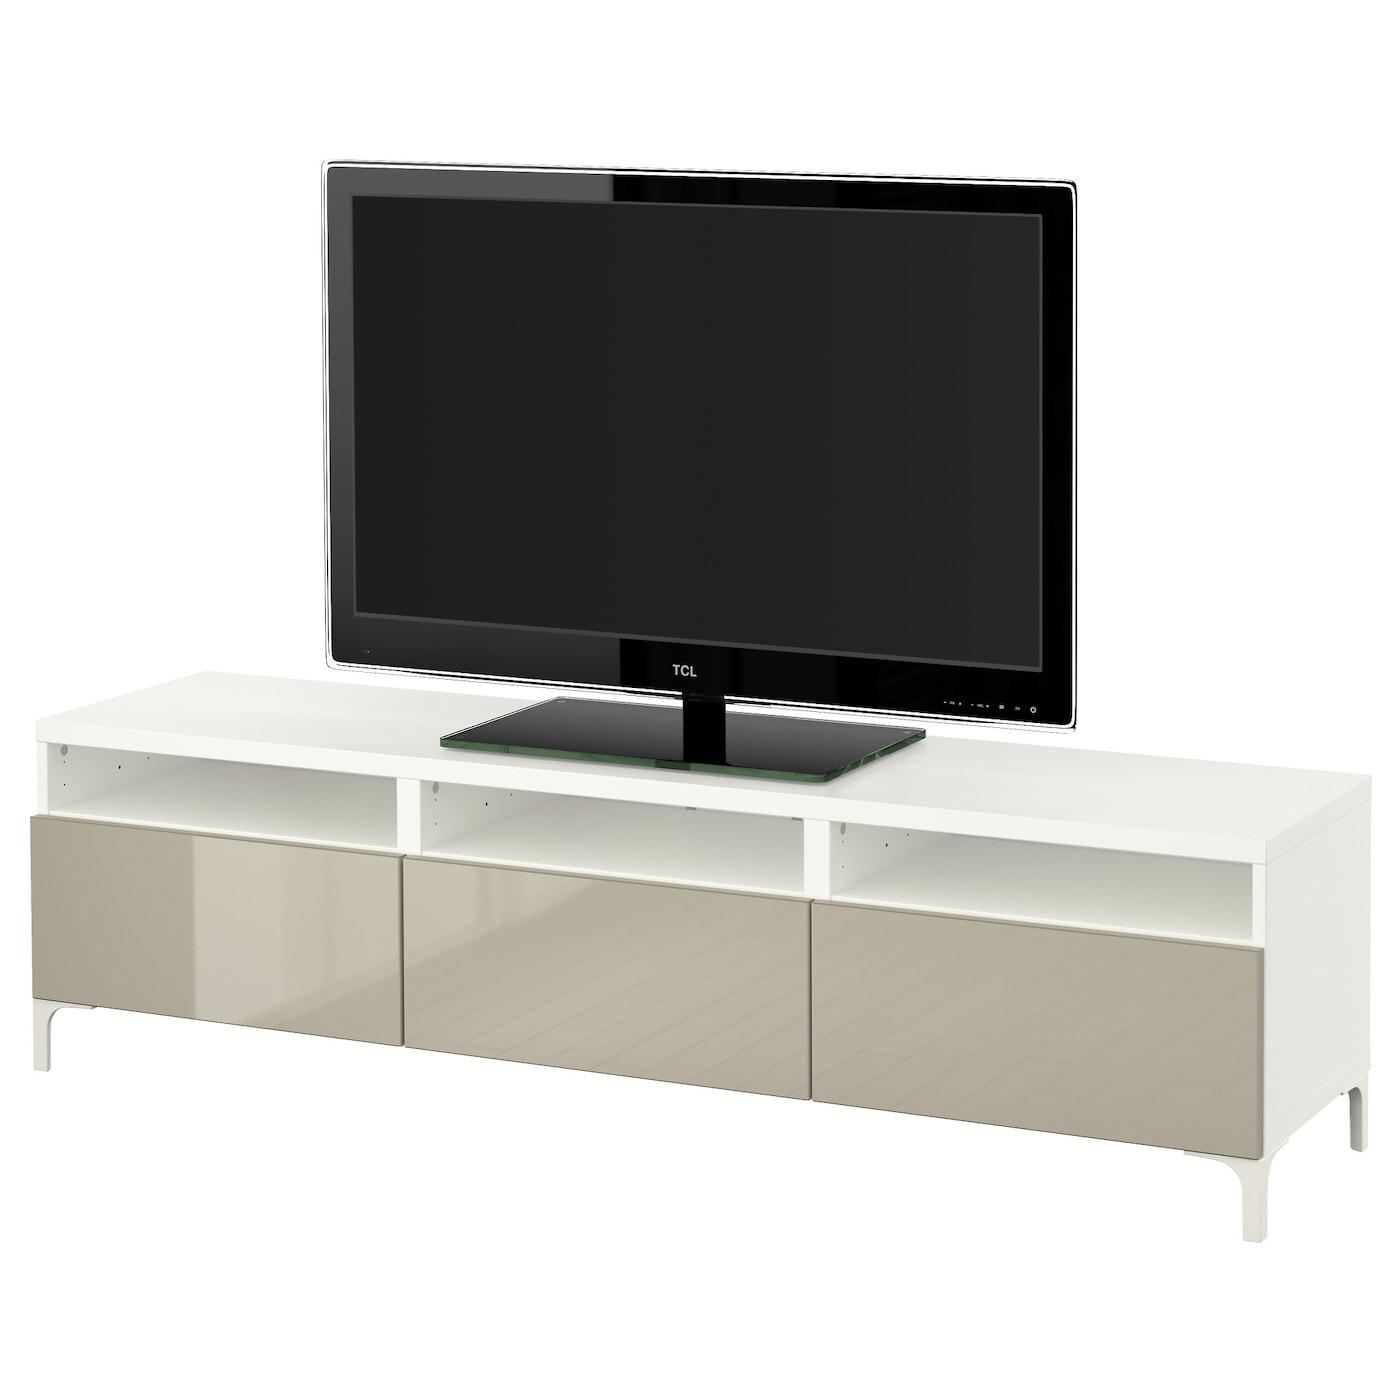 Best Tv Bench With Drawers White Selsviken High Gloss Beige 180x40x48 Cm Ikea